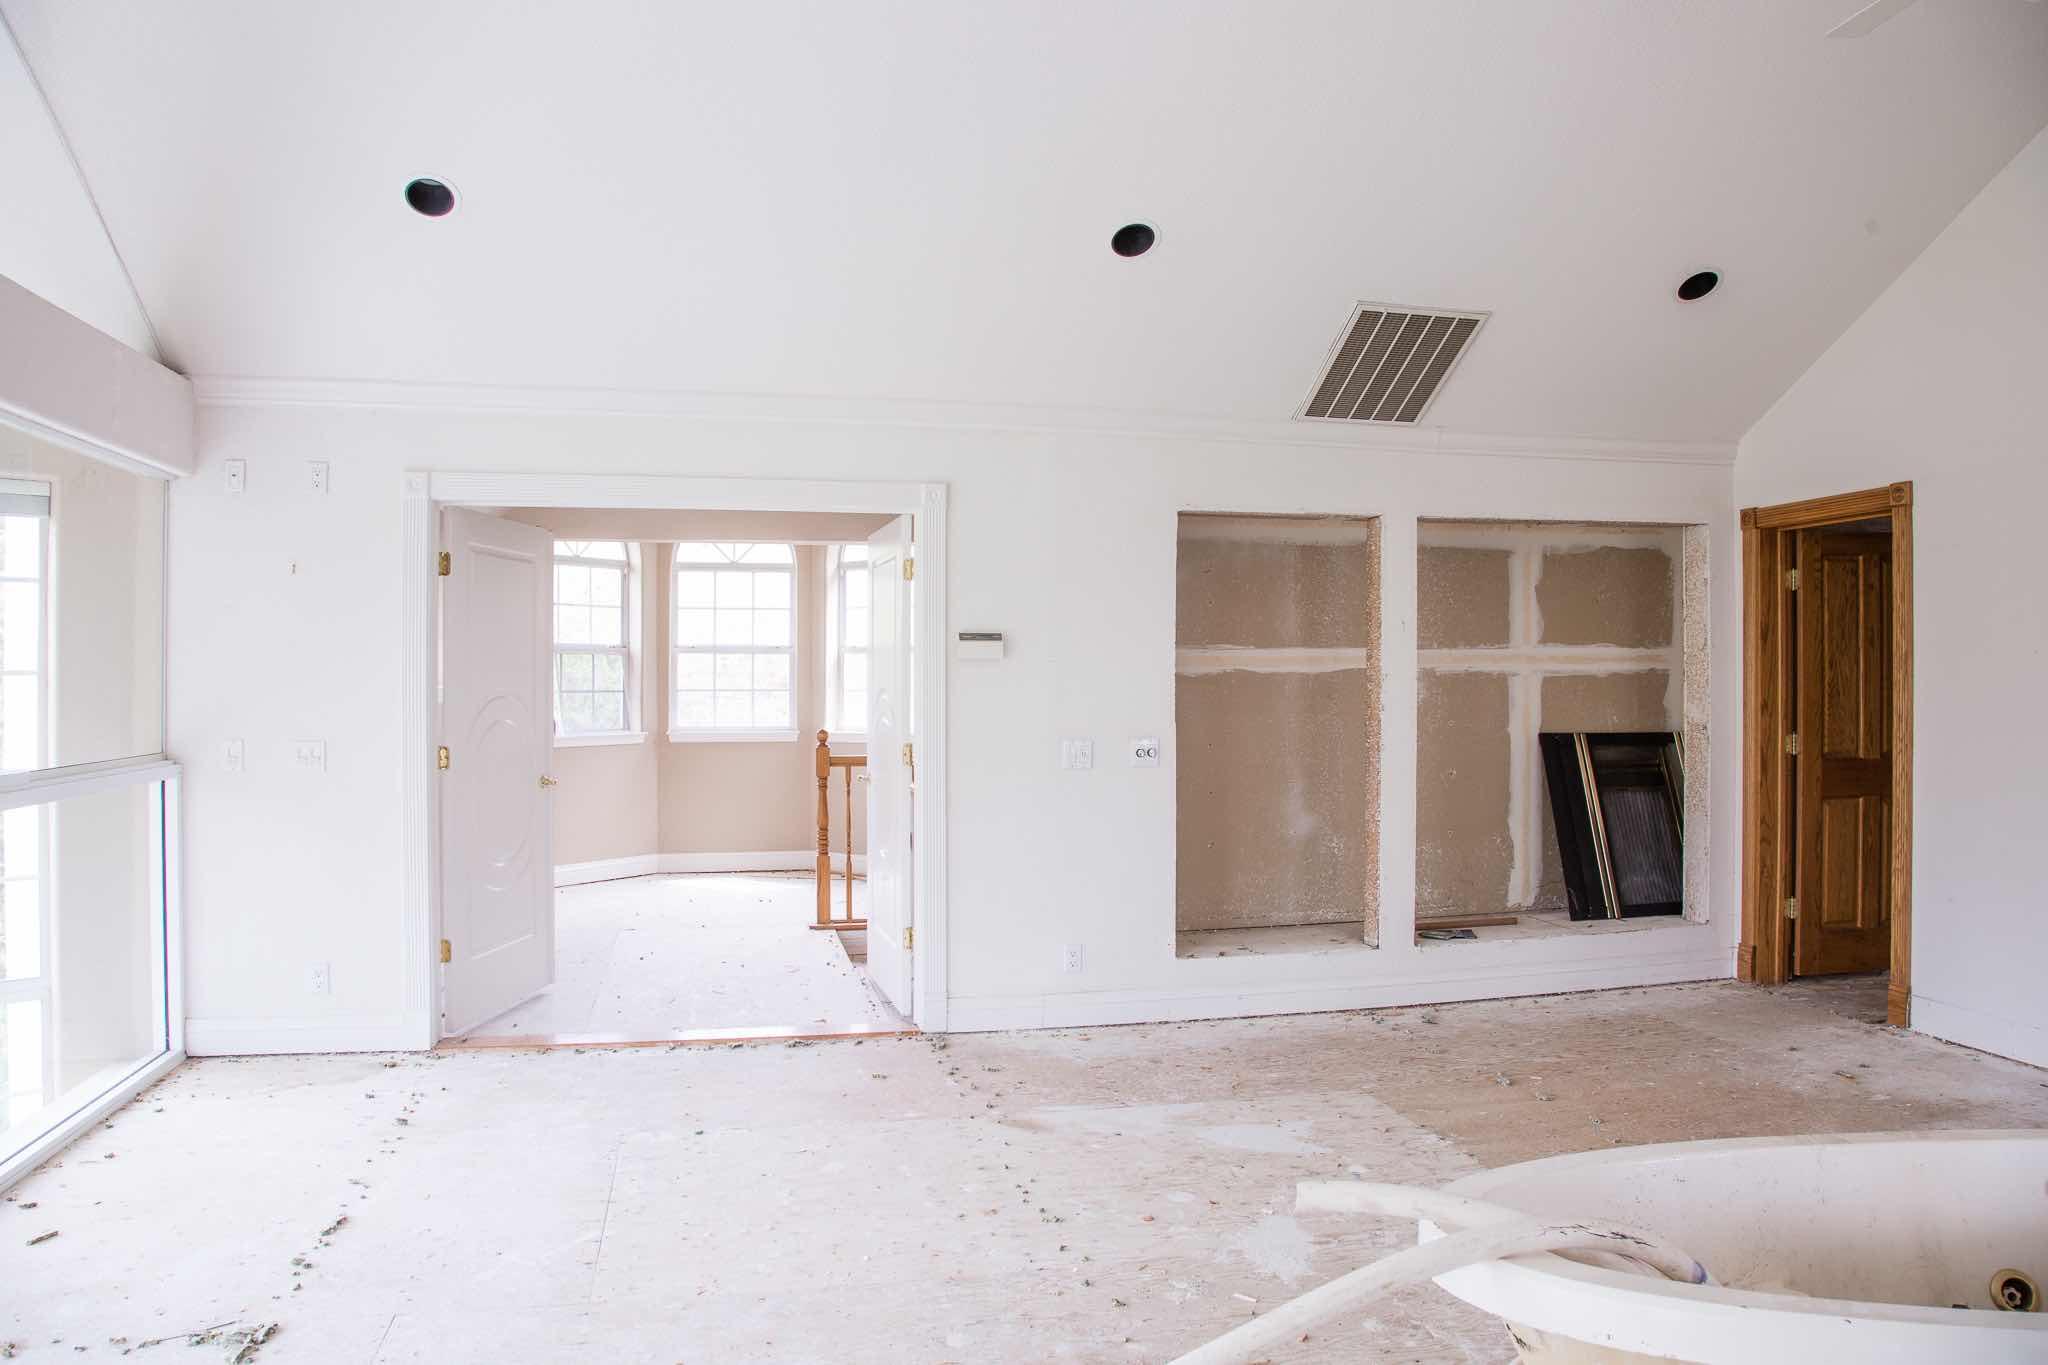 house remodel, home remodel, house renovation, home renovation, Sacramento CA